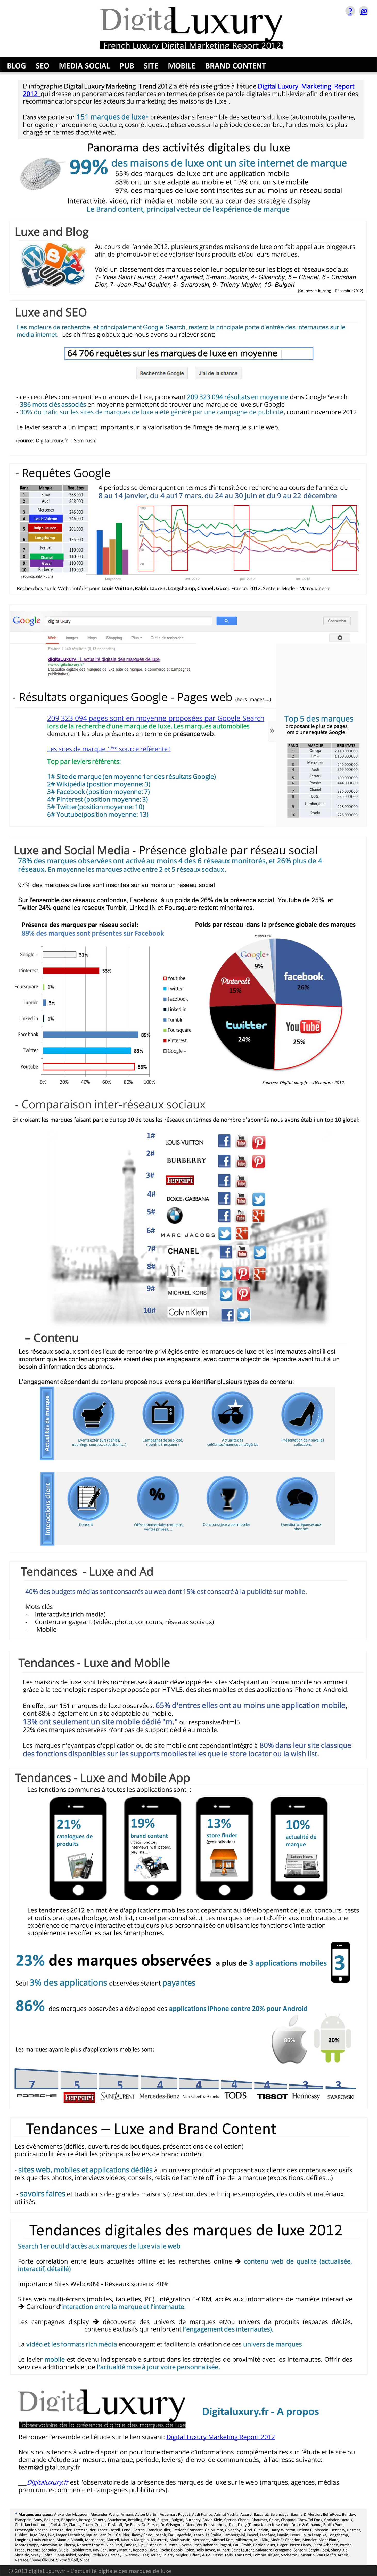 French Luxury Digital Marketing Report   Marketing